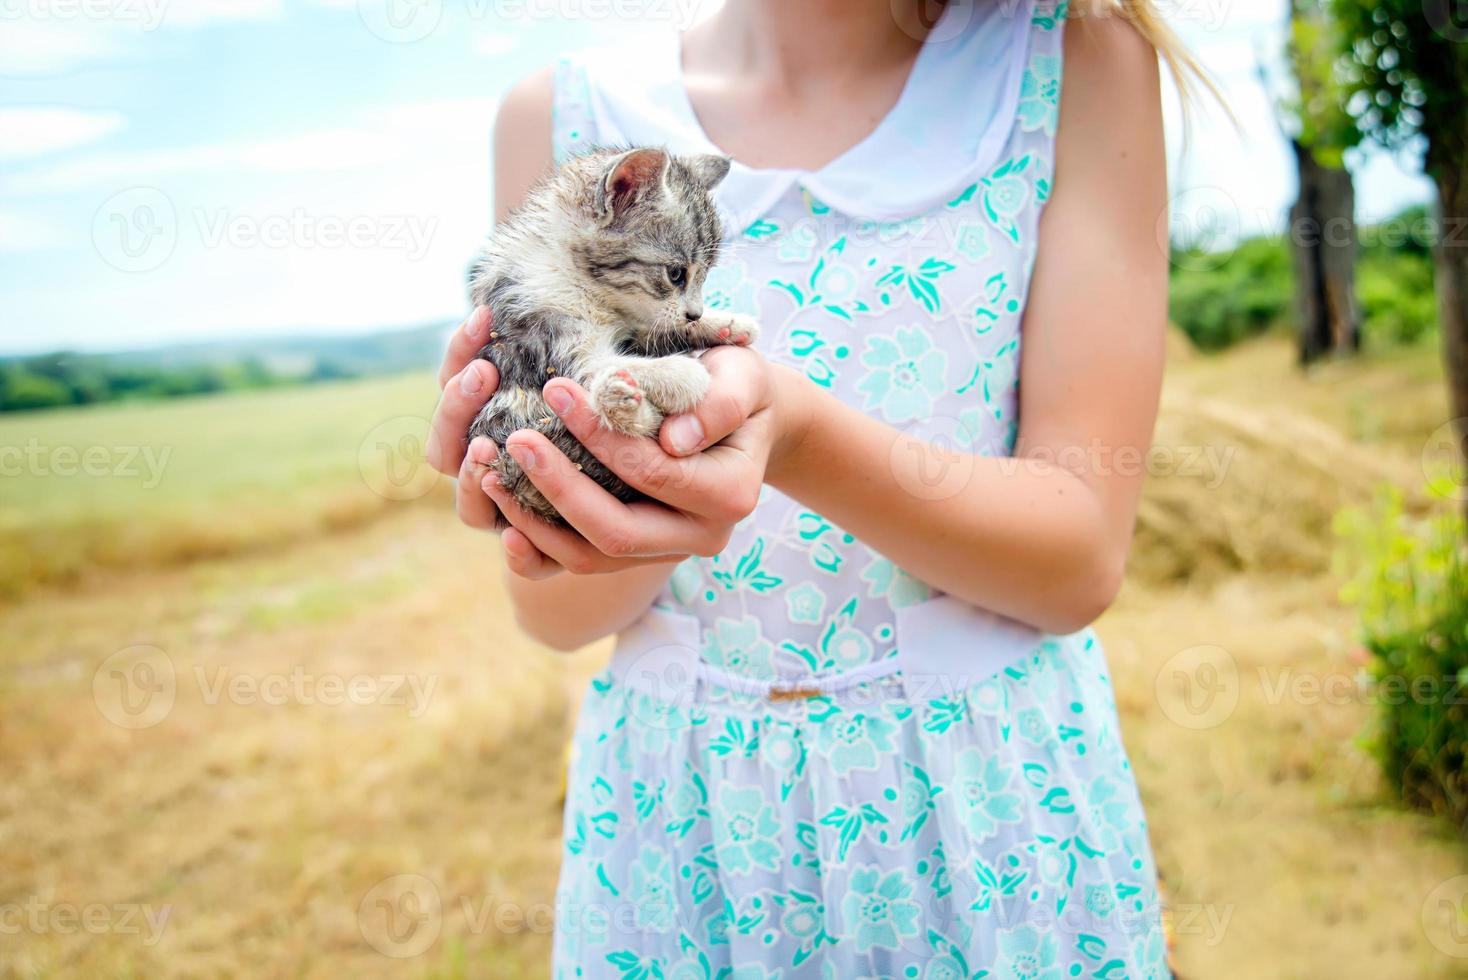 niña sosteniendo un gatito foto